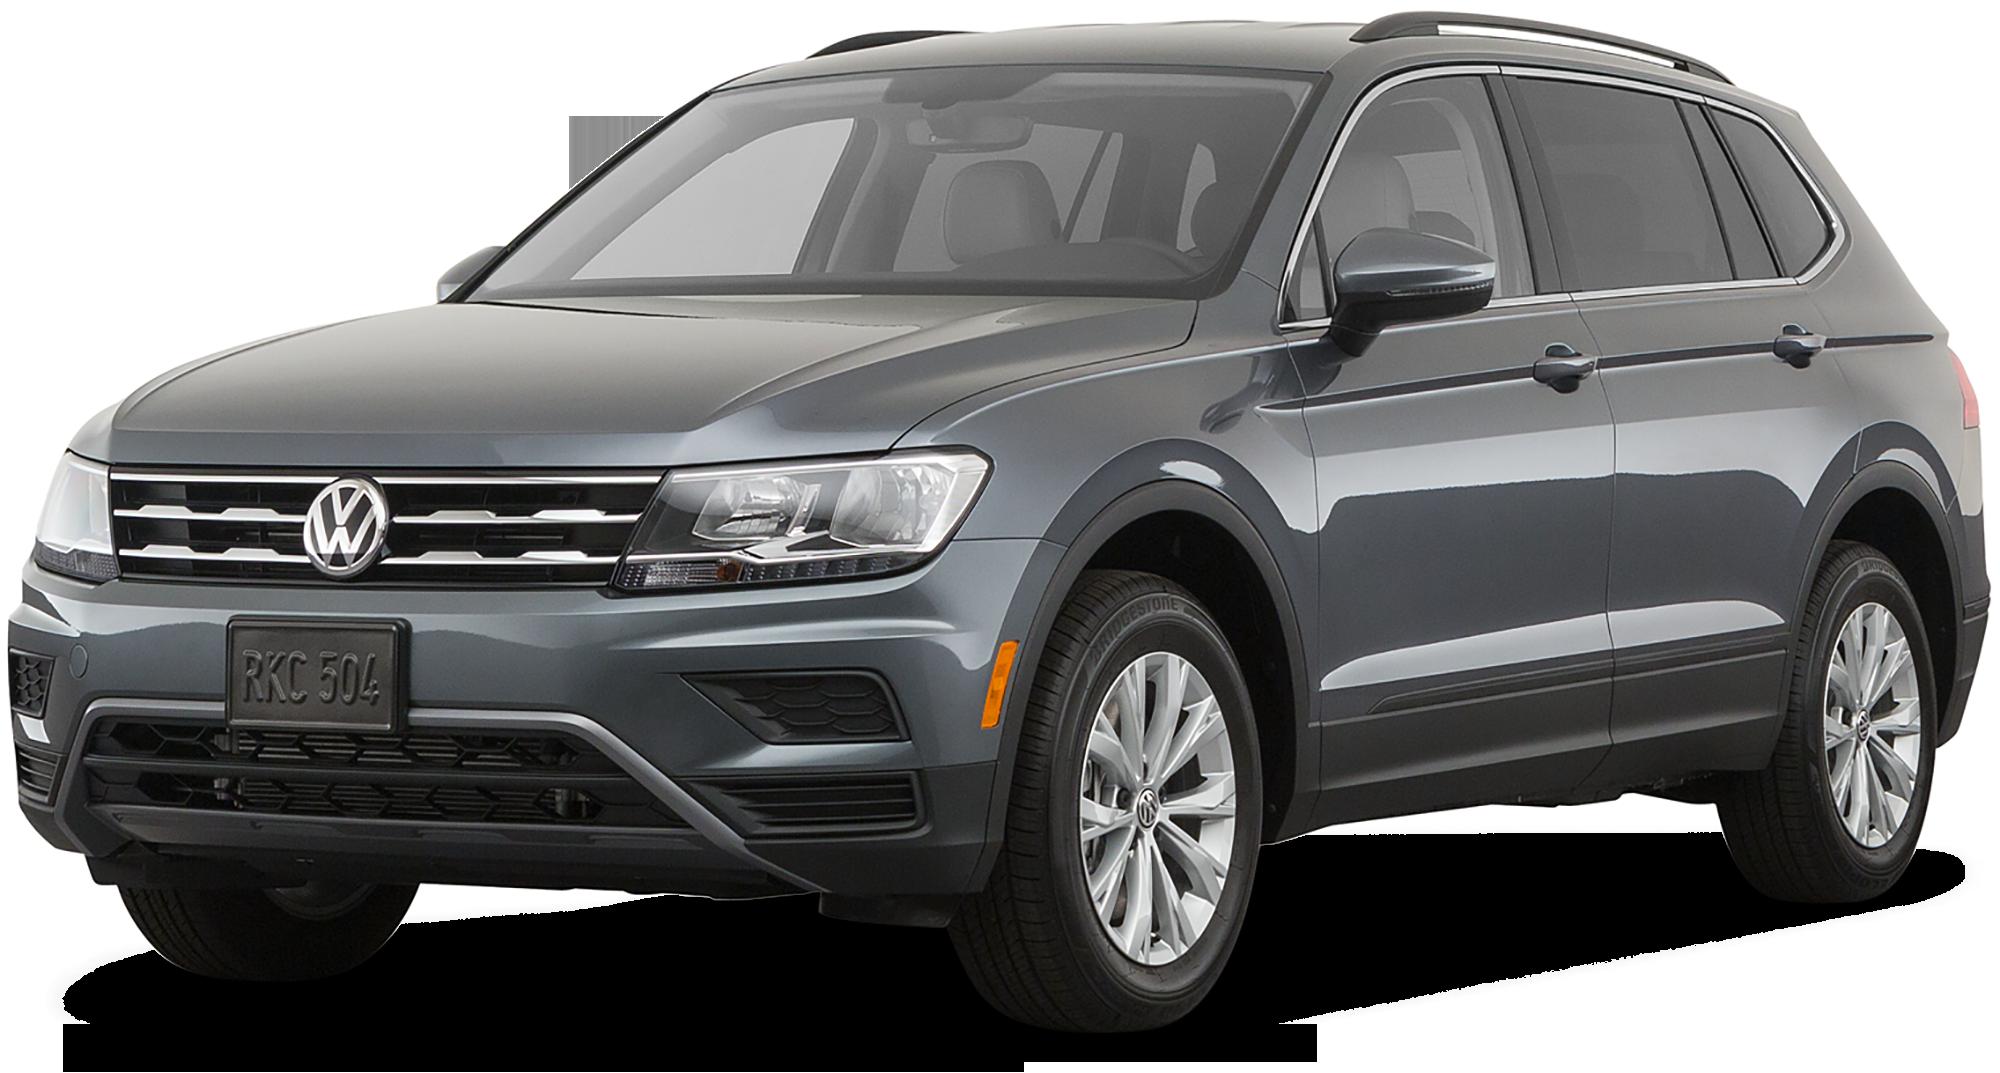 2020 Volkswagen Tiguan Incentives, Specials & Offers in ...